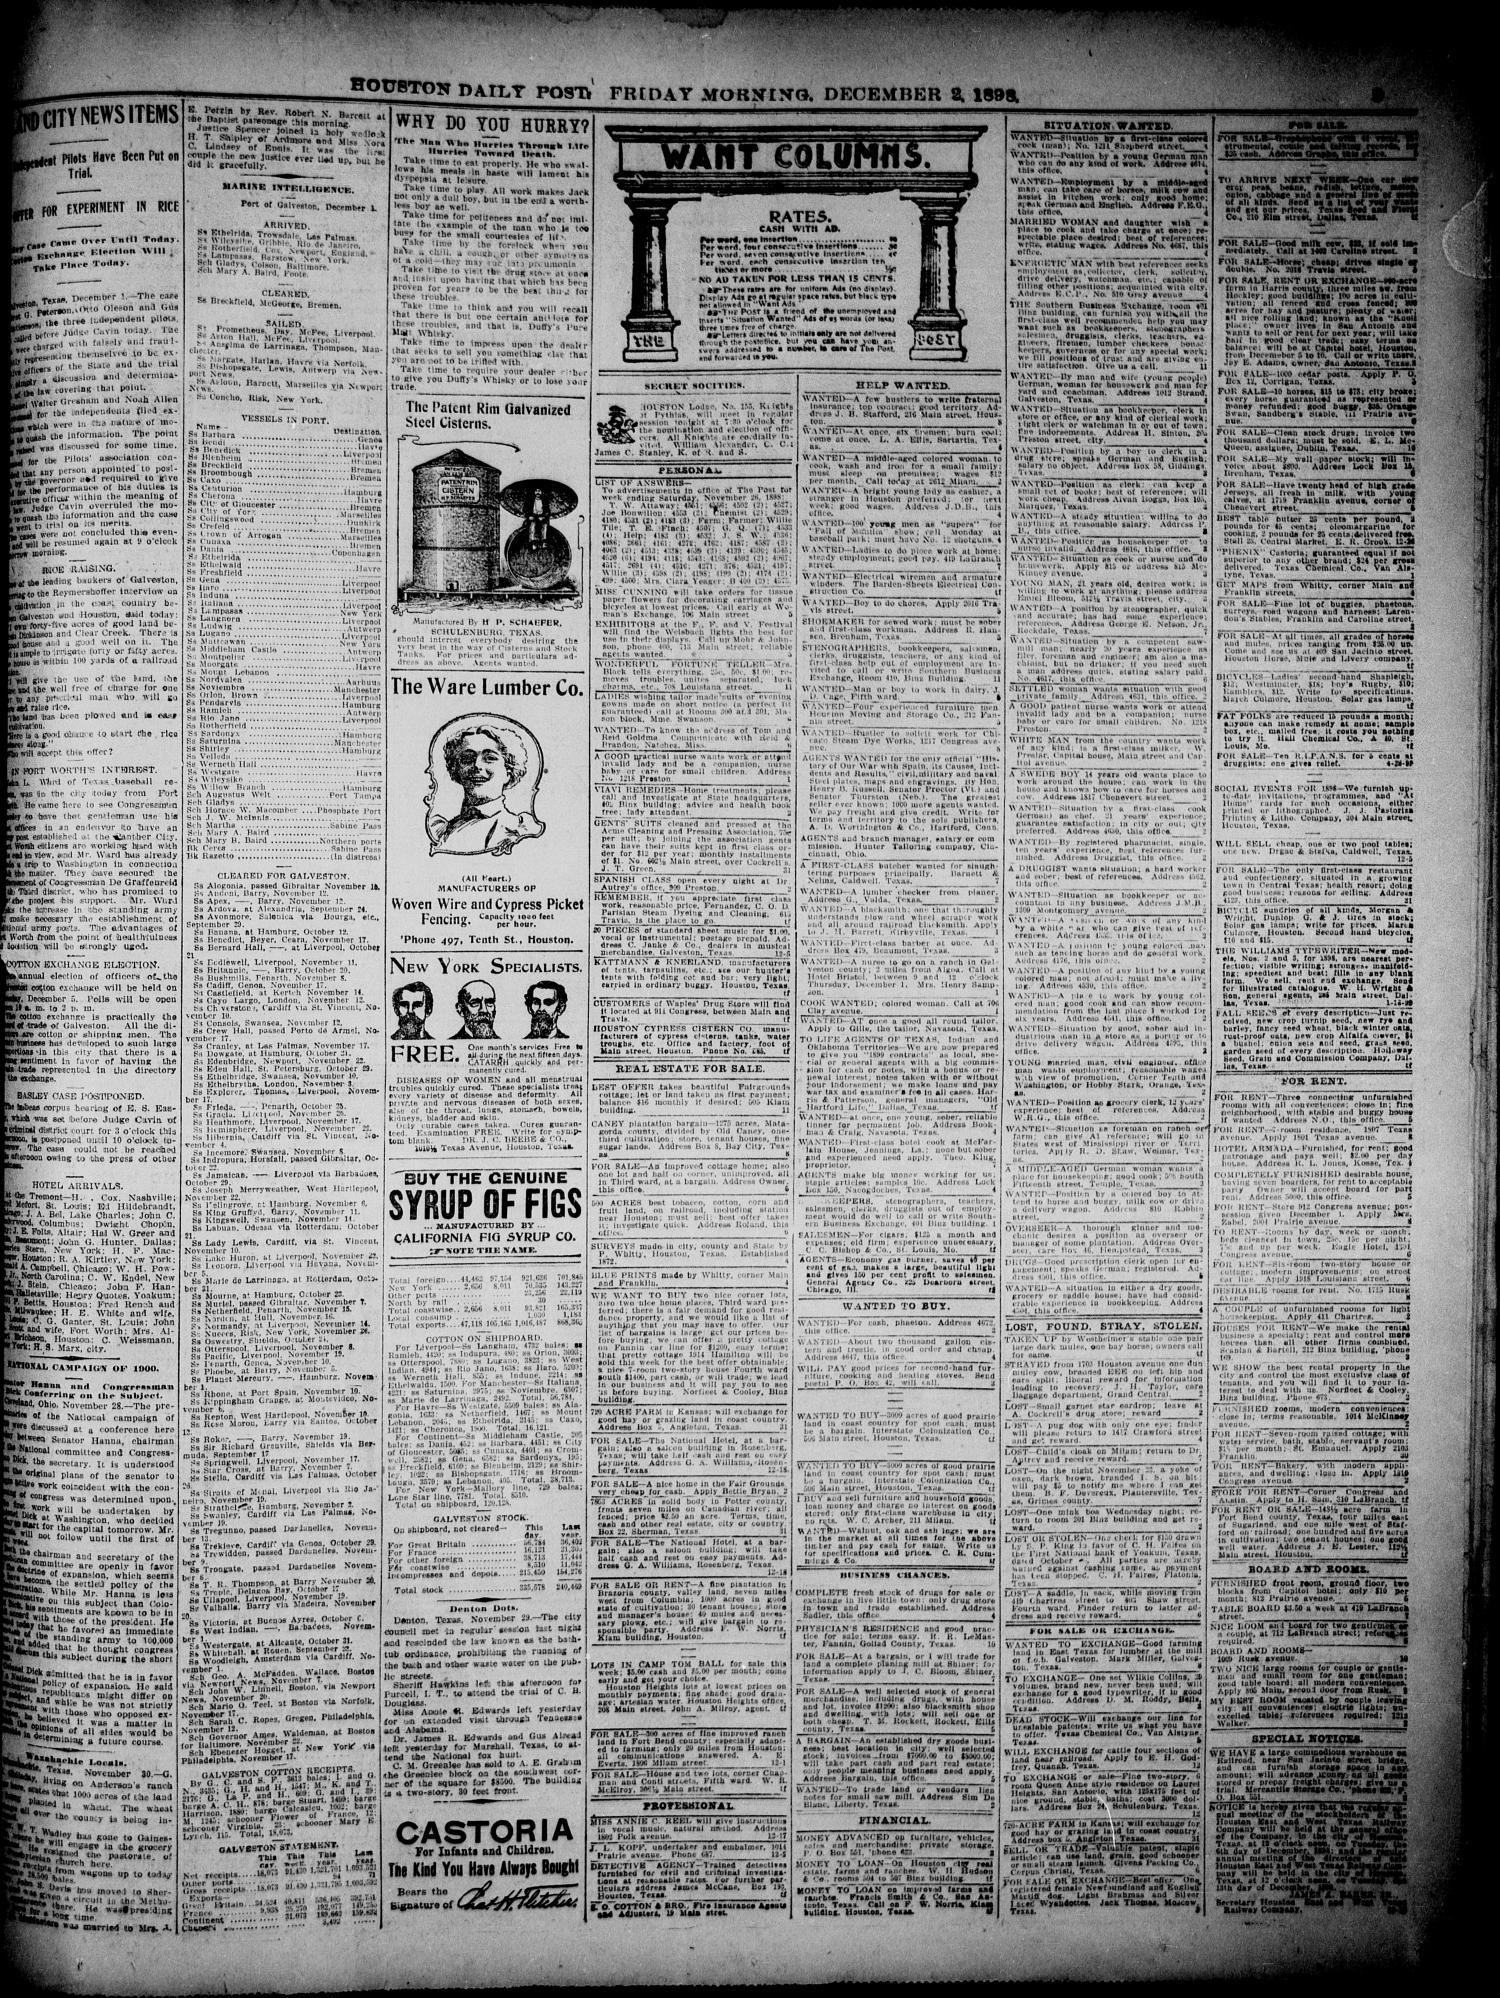 The Houston Daily Post (Houston, Tex ), Vol  14, No  244, Ed